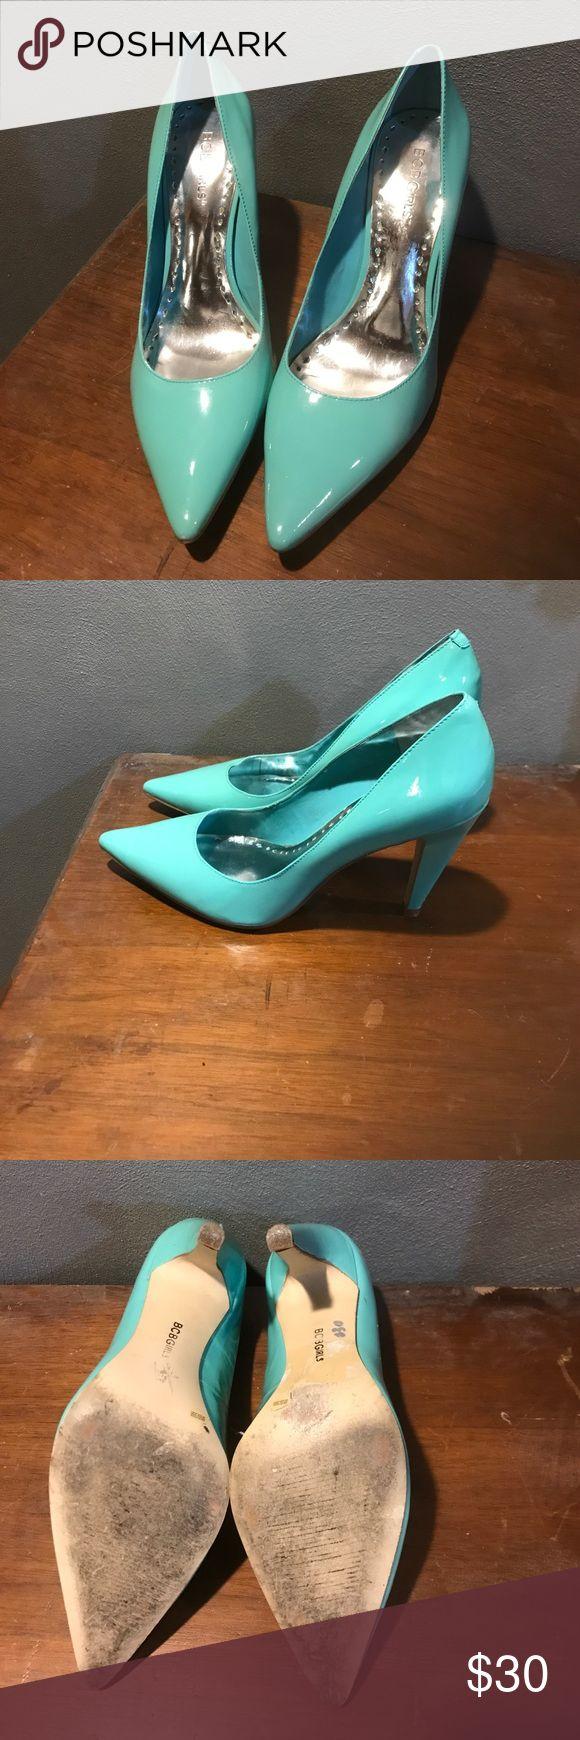 BCBG Aqua Heels BCBG Girls Aqua Heels size us: 8 1/2. In gently used condition. 4inch heel. BCBG Shoes Heels